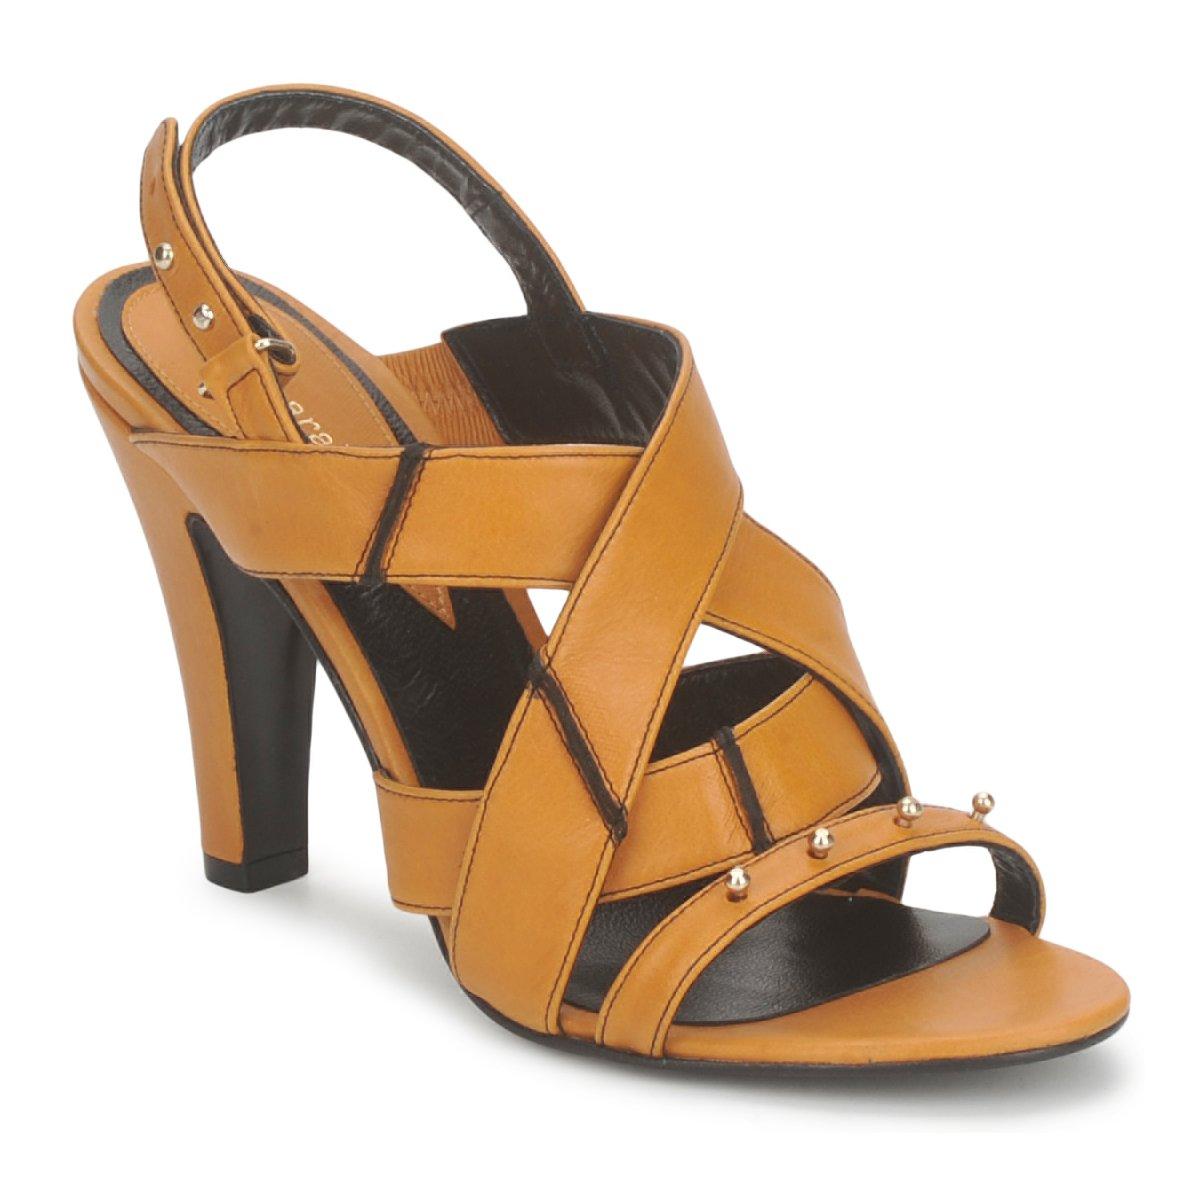 Sandale Karine Arabian DOLORES Safran-noir